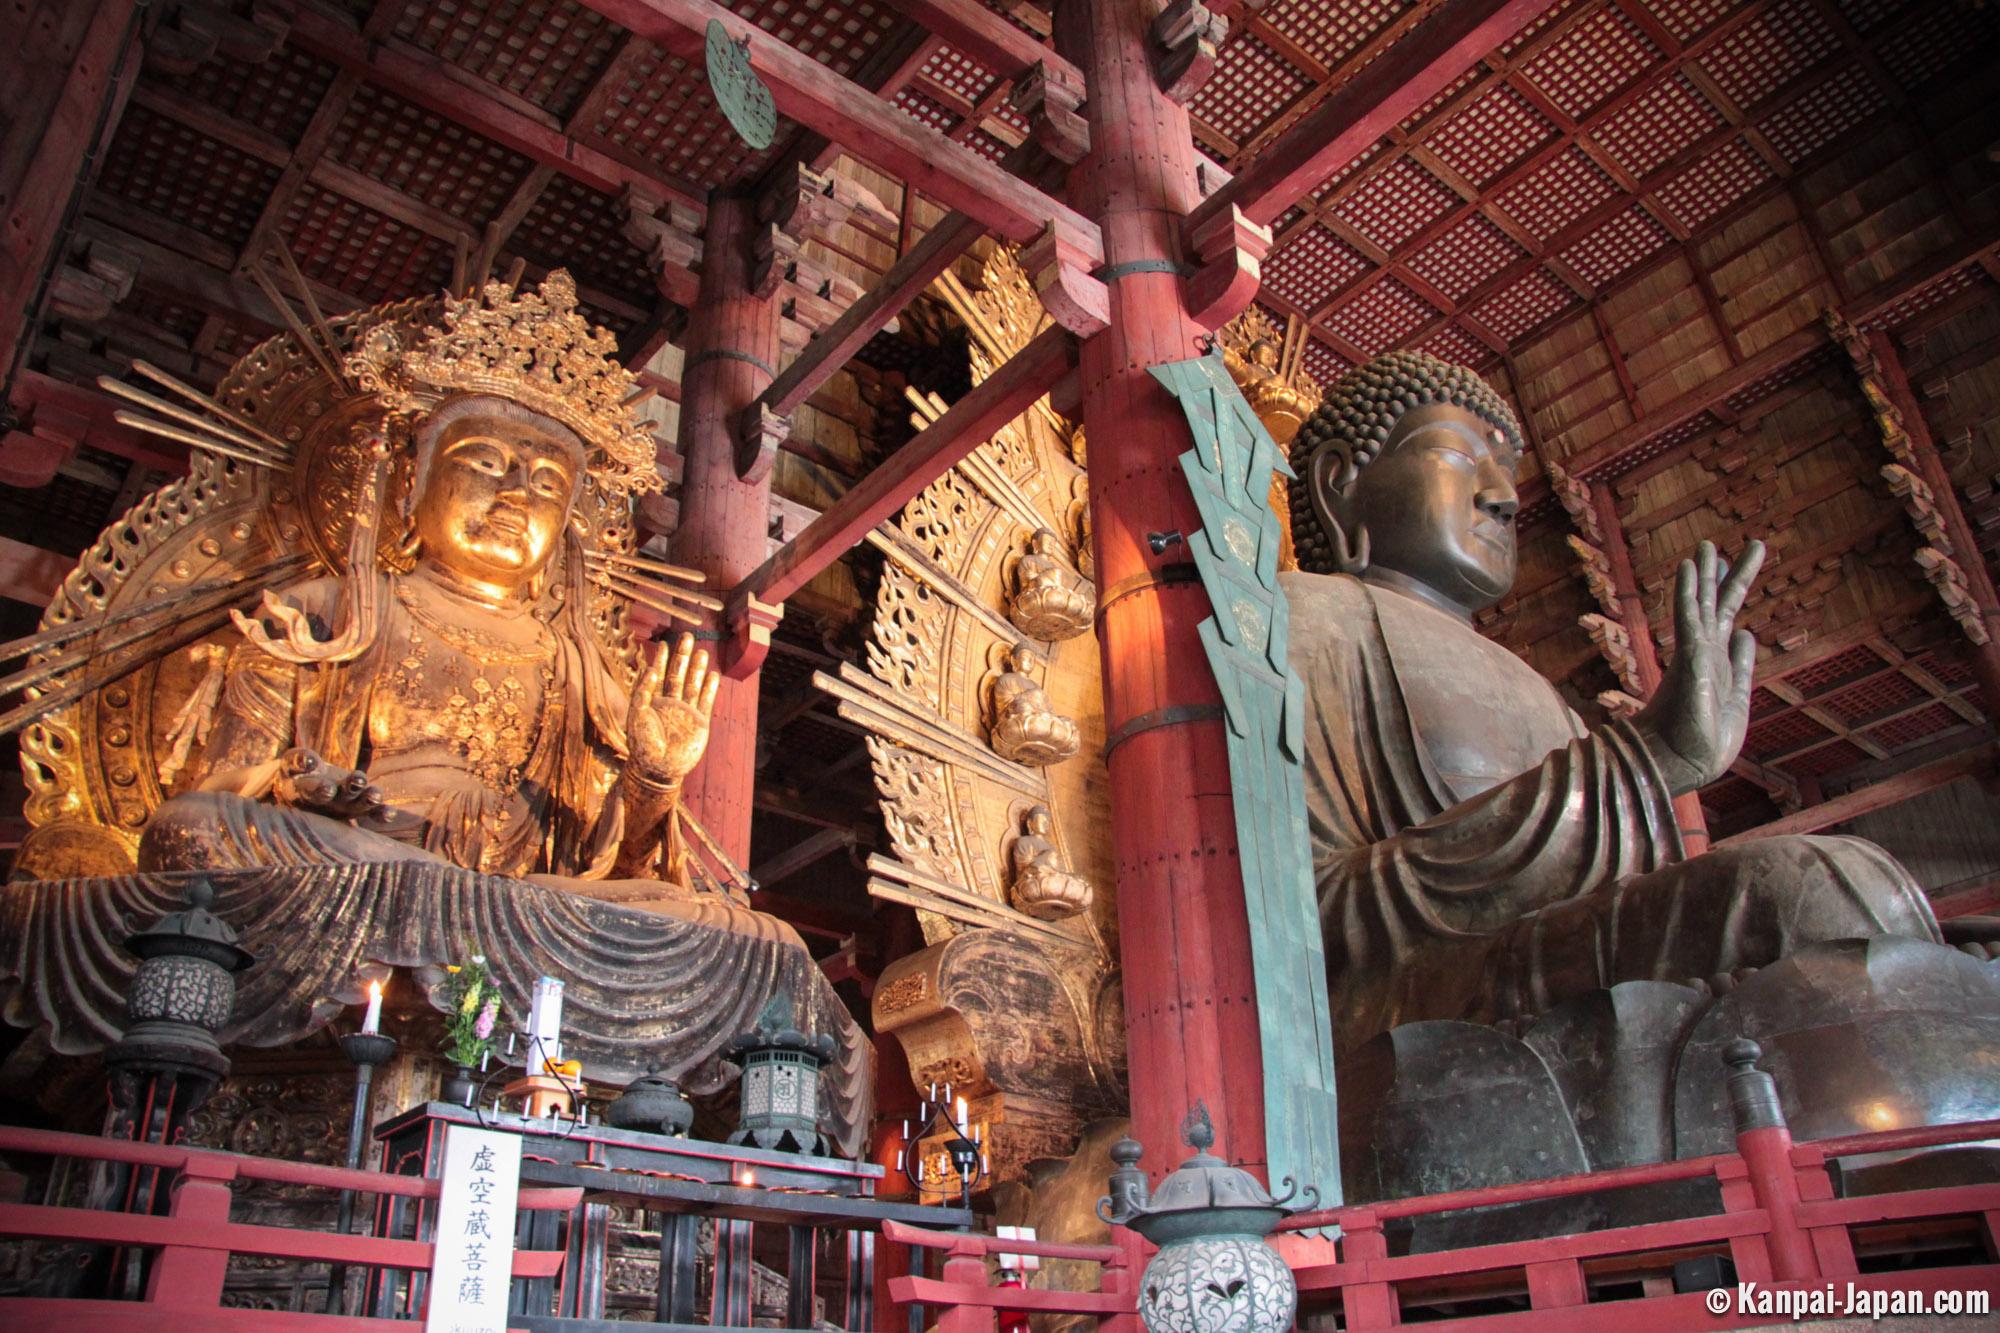 Todai-ji - Nara's Great Buddha Temple